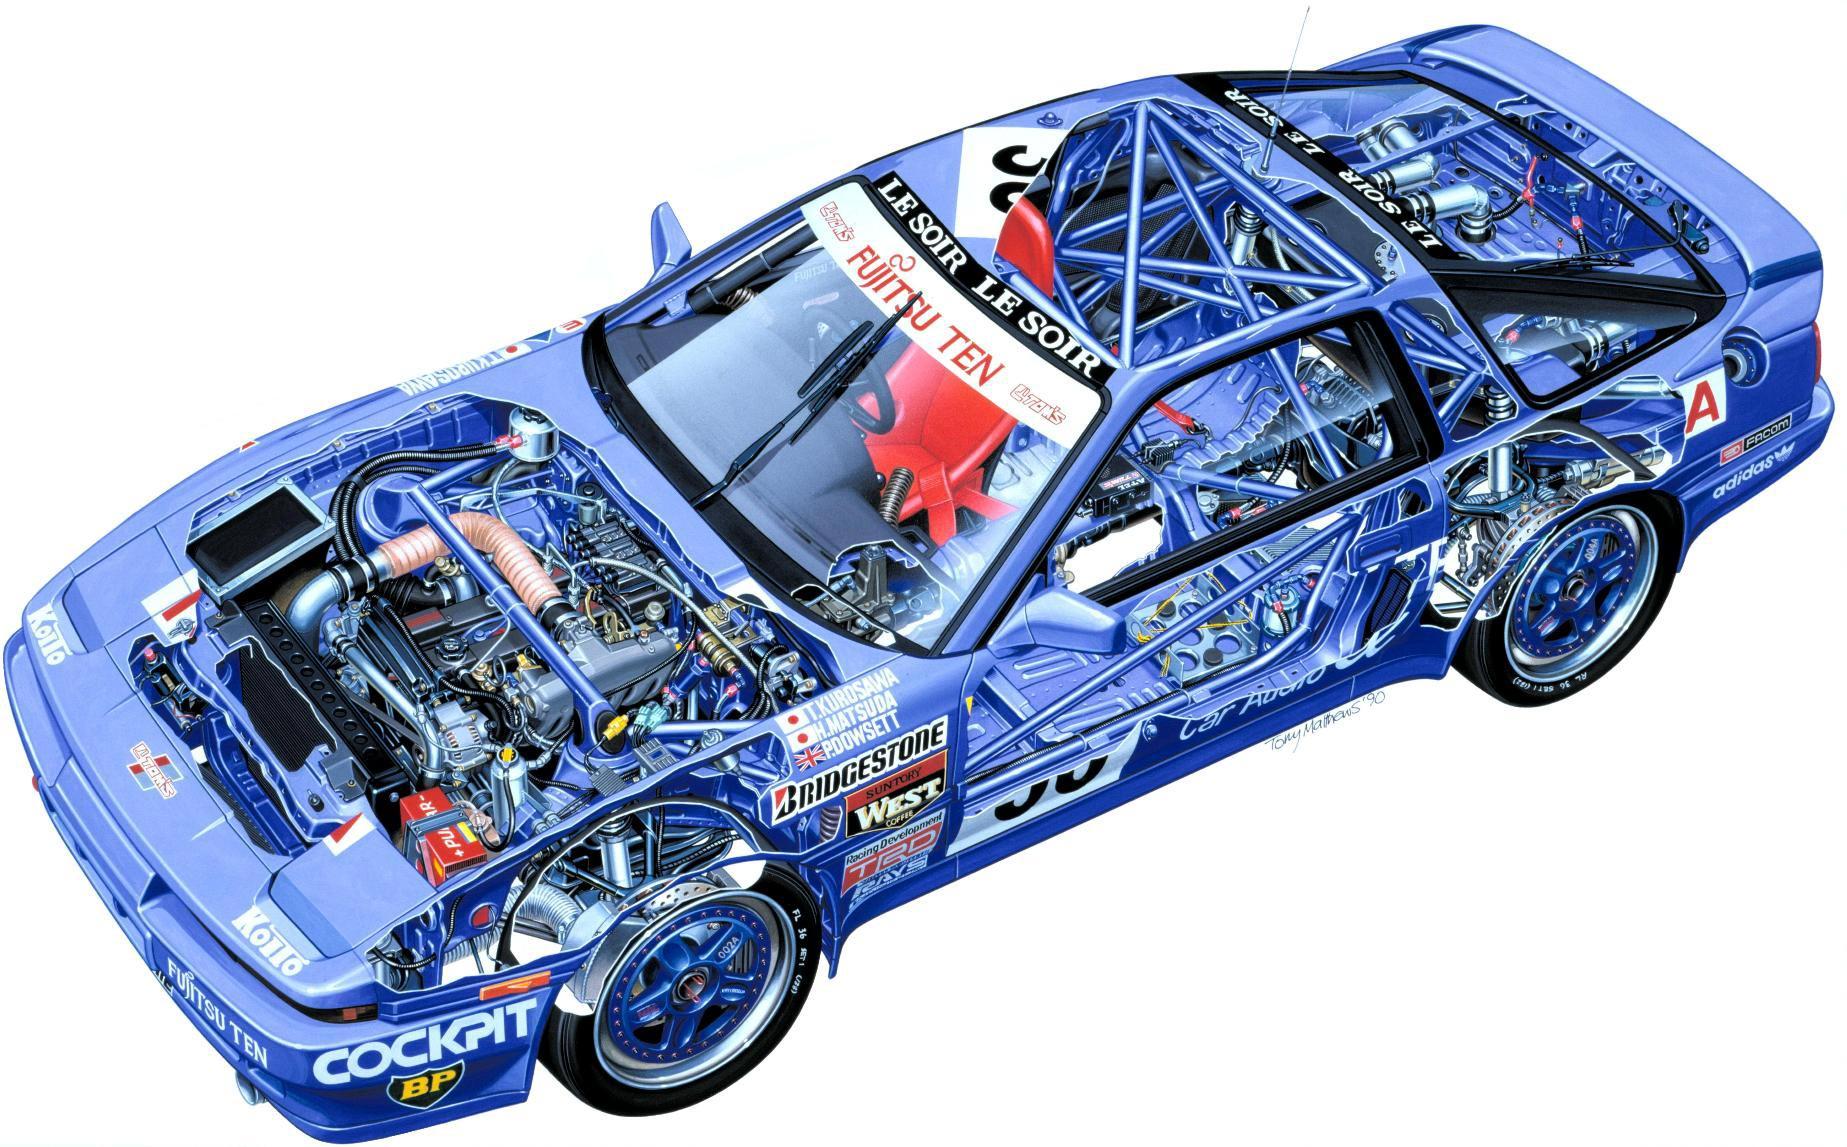 Toyota Supra cutaway